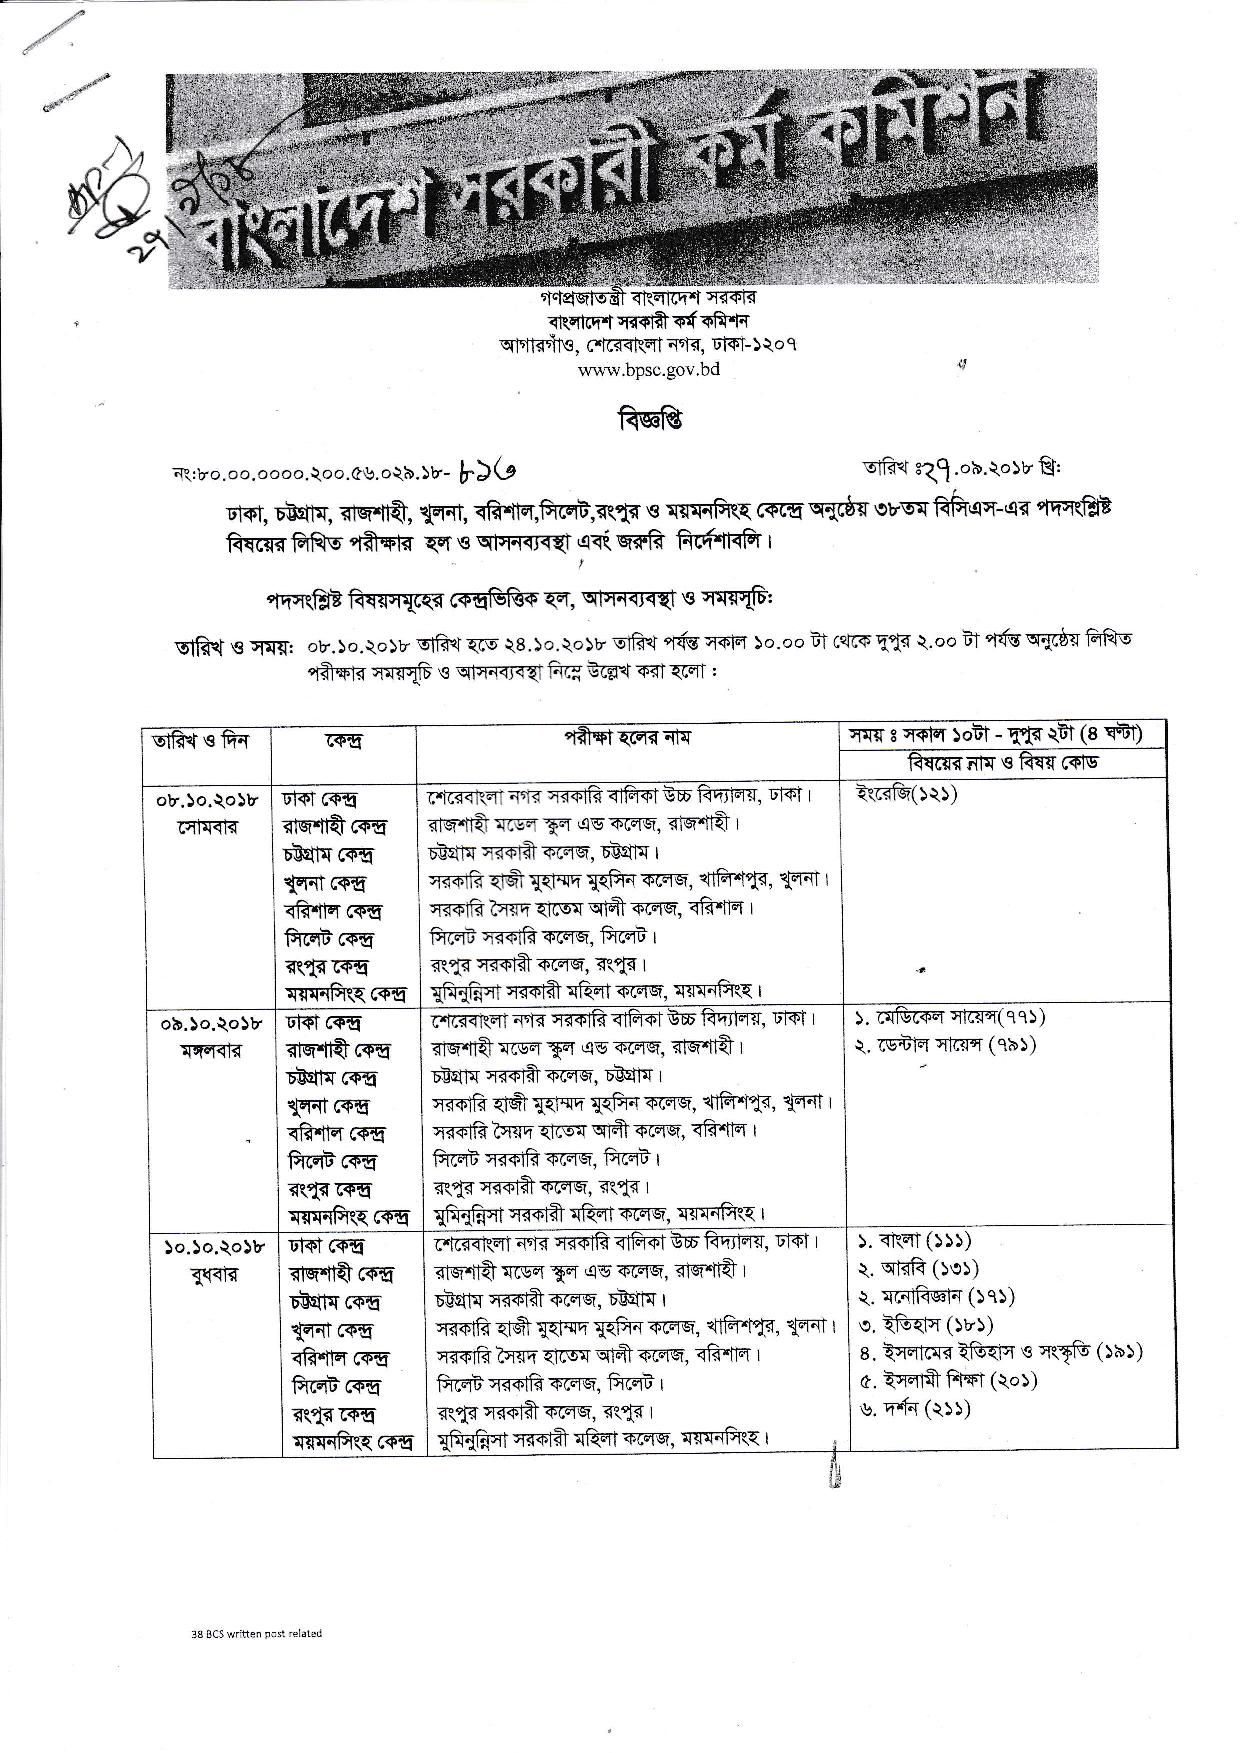 38 BCS Seat Plan Notice & Exam Date 2018 - www bpsc gov bd